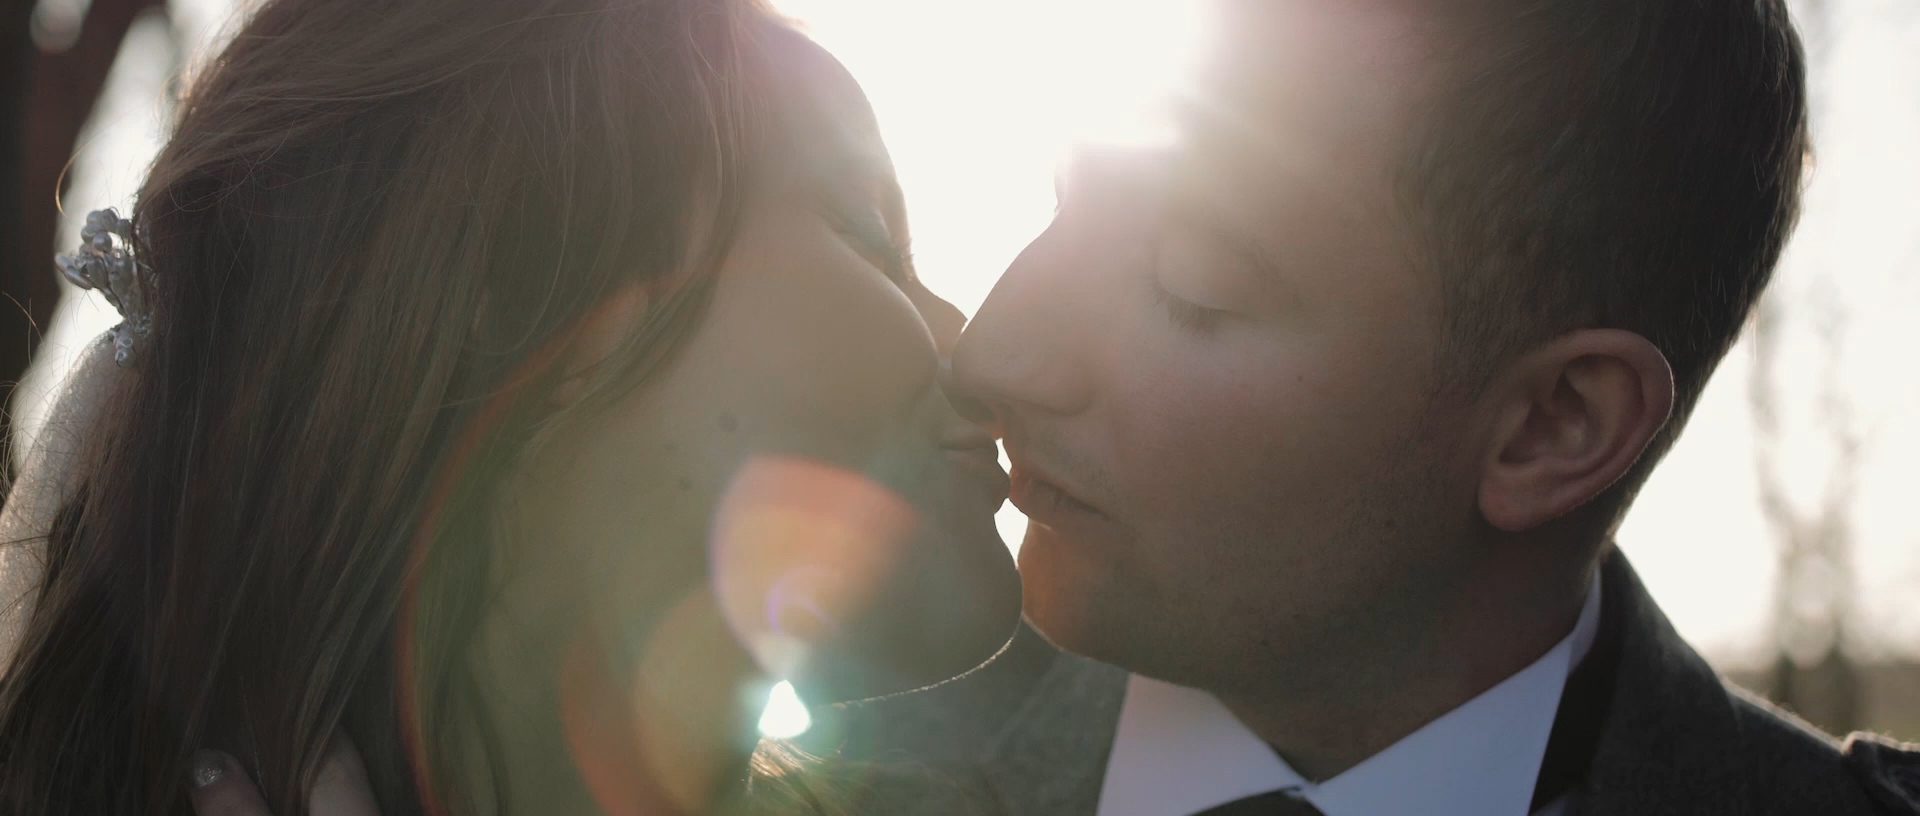 west-on-the-green-wedding-videographer_LL_03.jpg